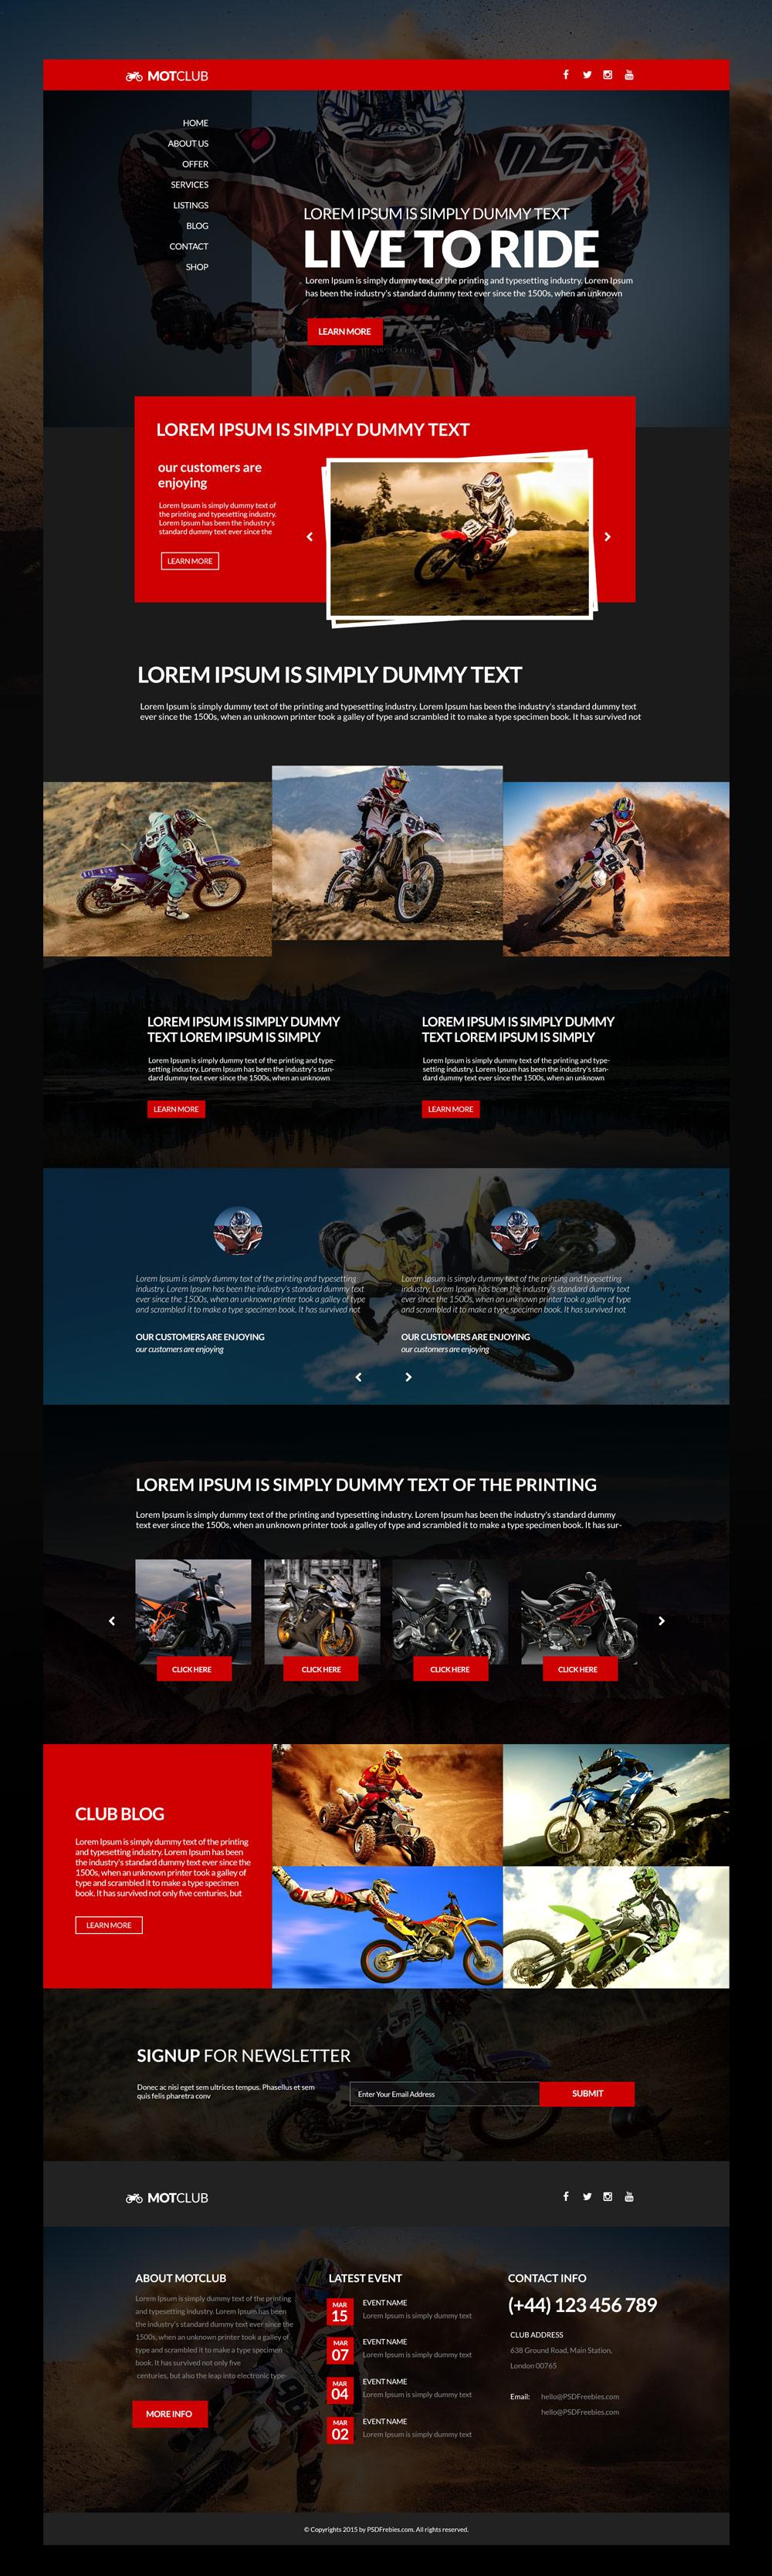 Bikers Club Website Free PSD Template